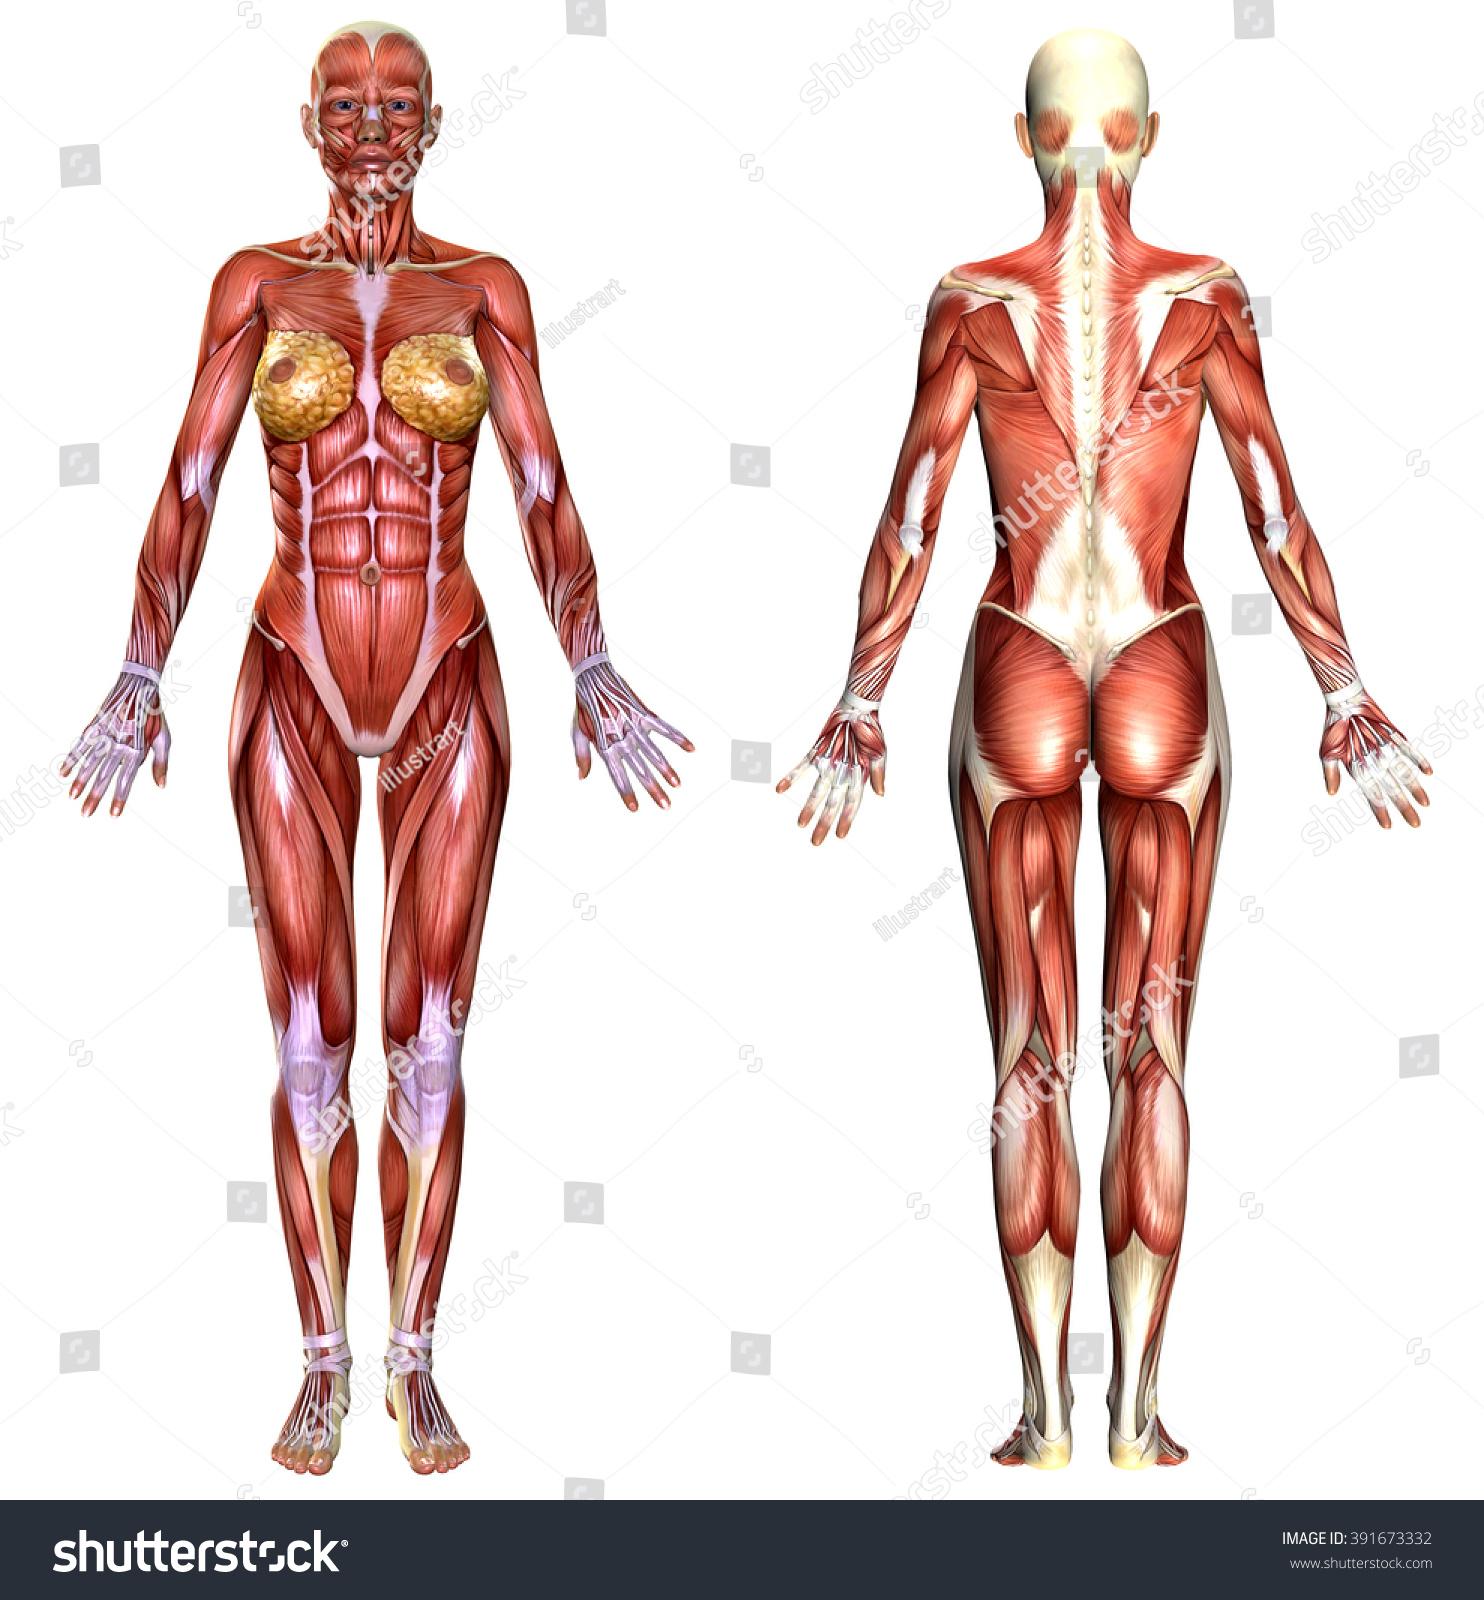 3 D Female Body Anatomy Isolated On Ilustración de stock391673332 ...